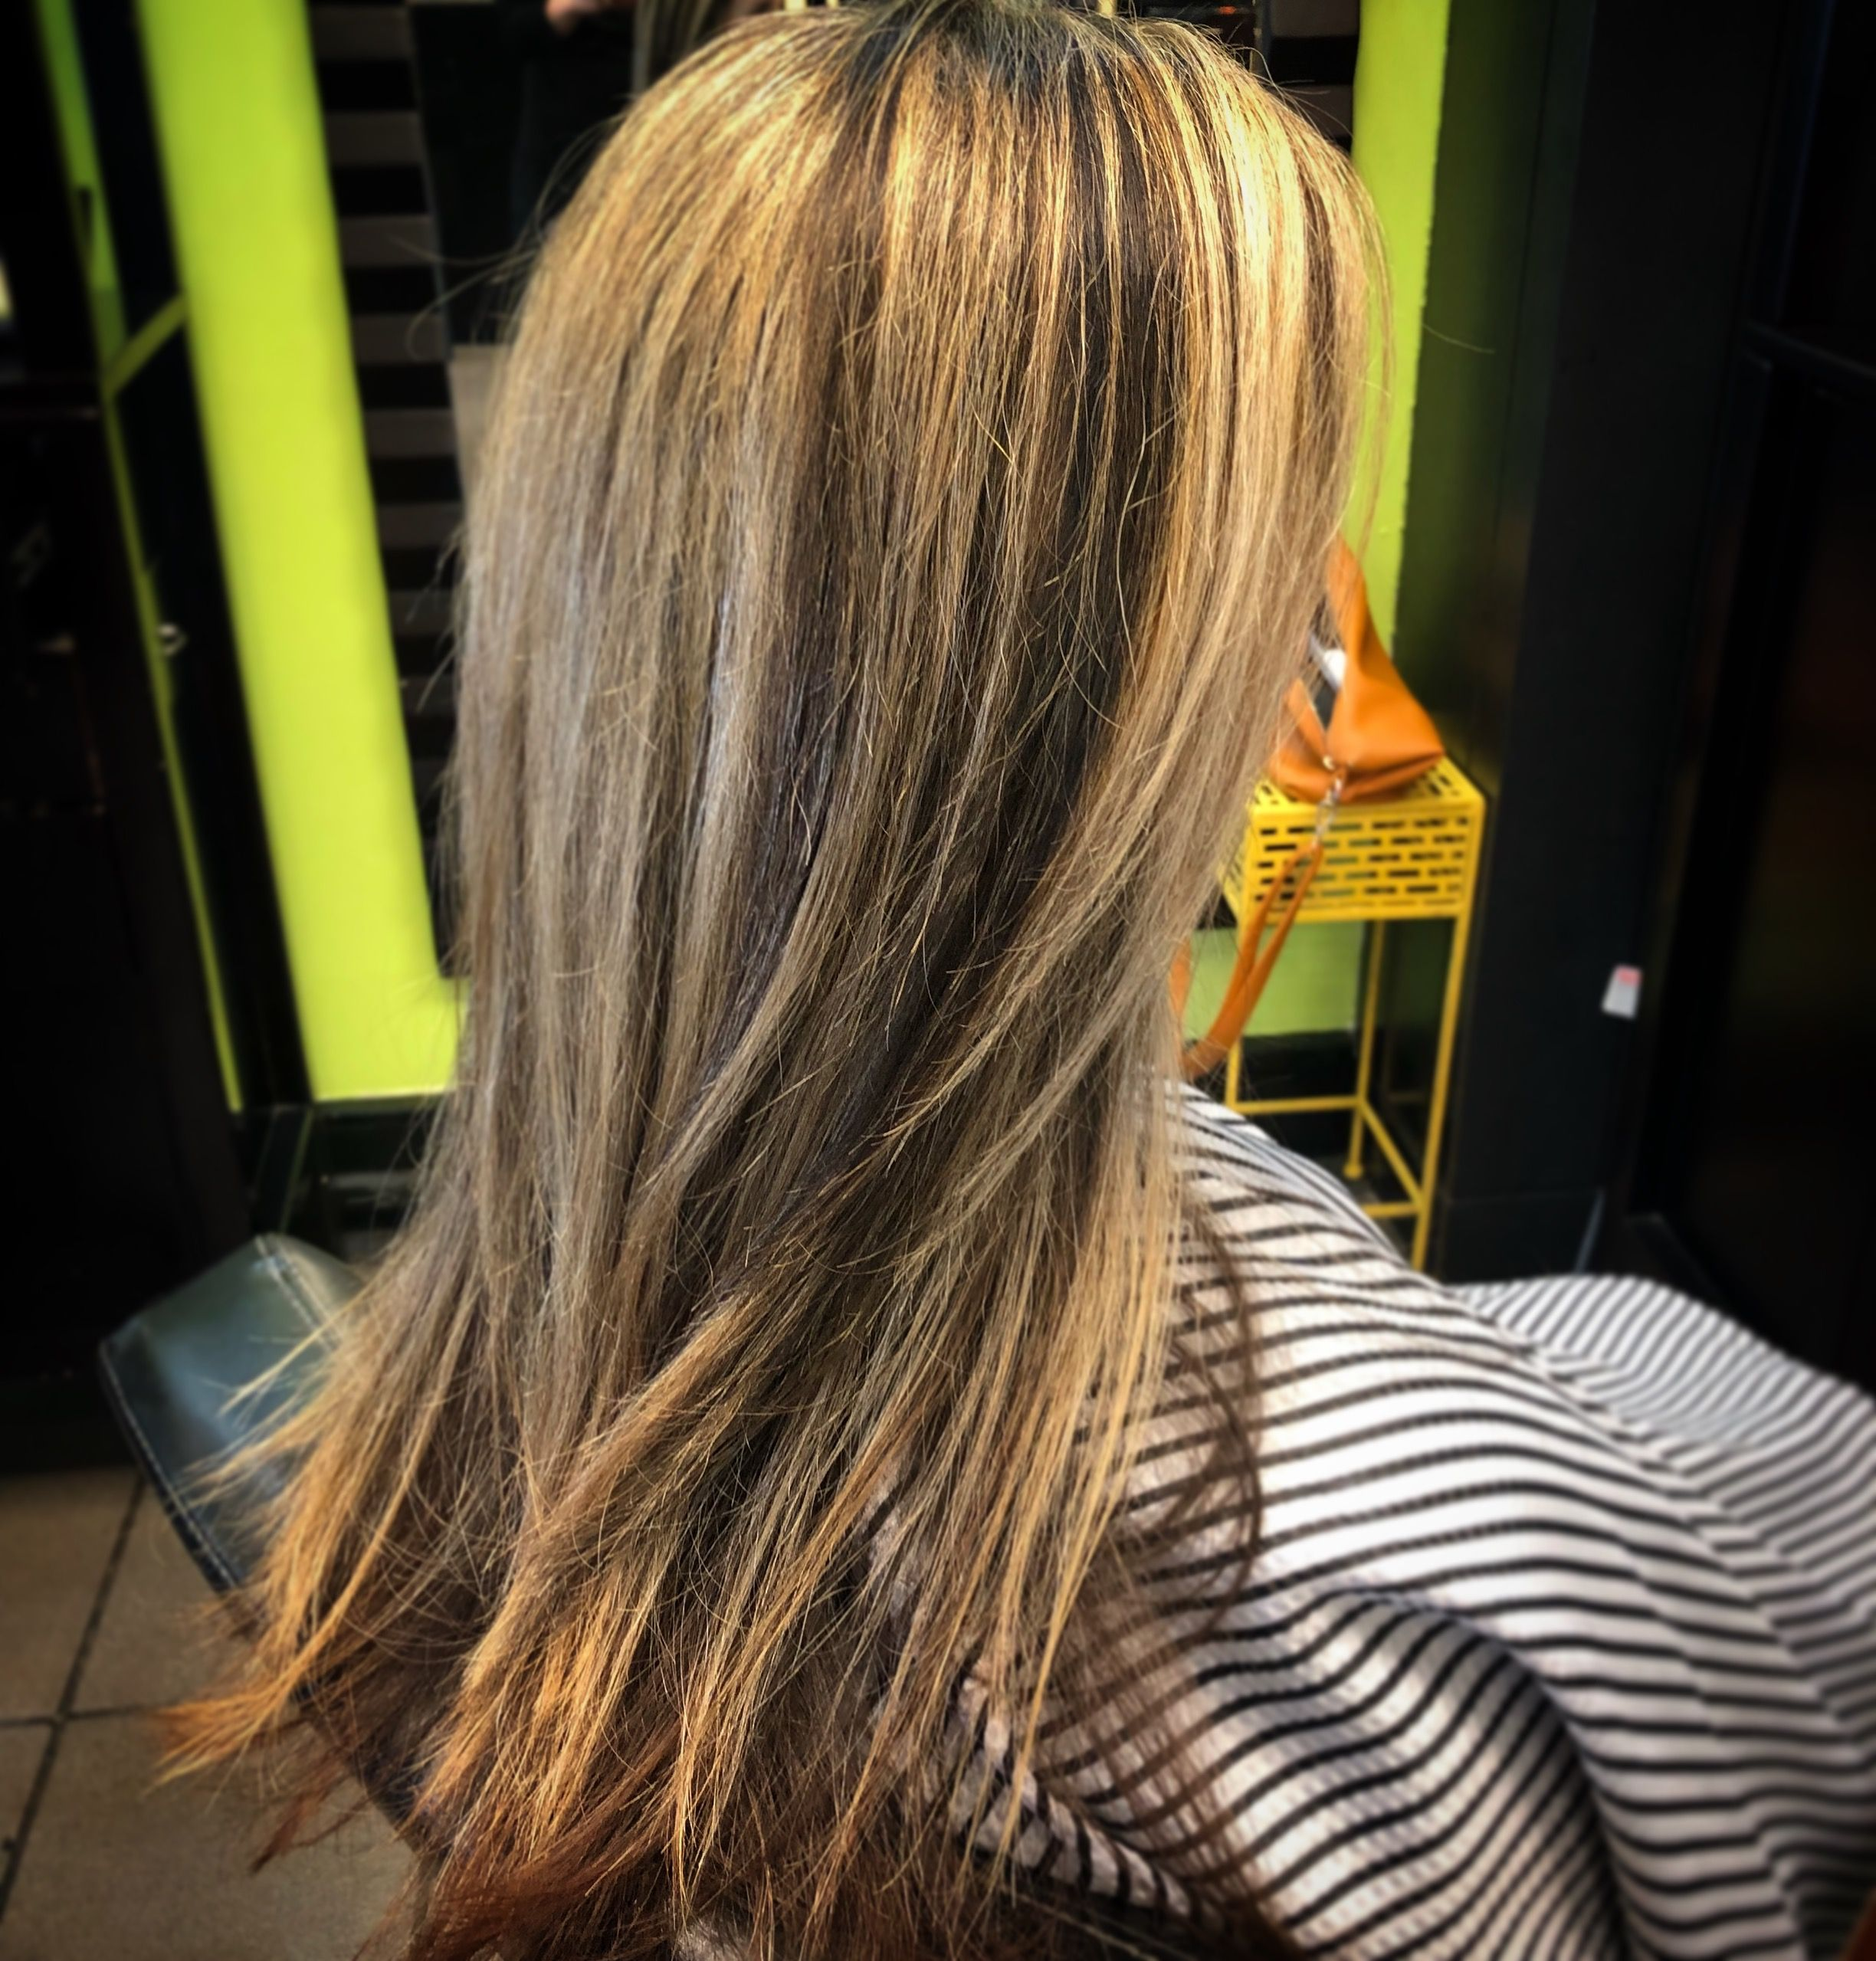 Hair Highlight Beauty Haircut 757hair Tangledupsalonvb Vabeachhair Beach Hair Hair Hair Salon